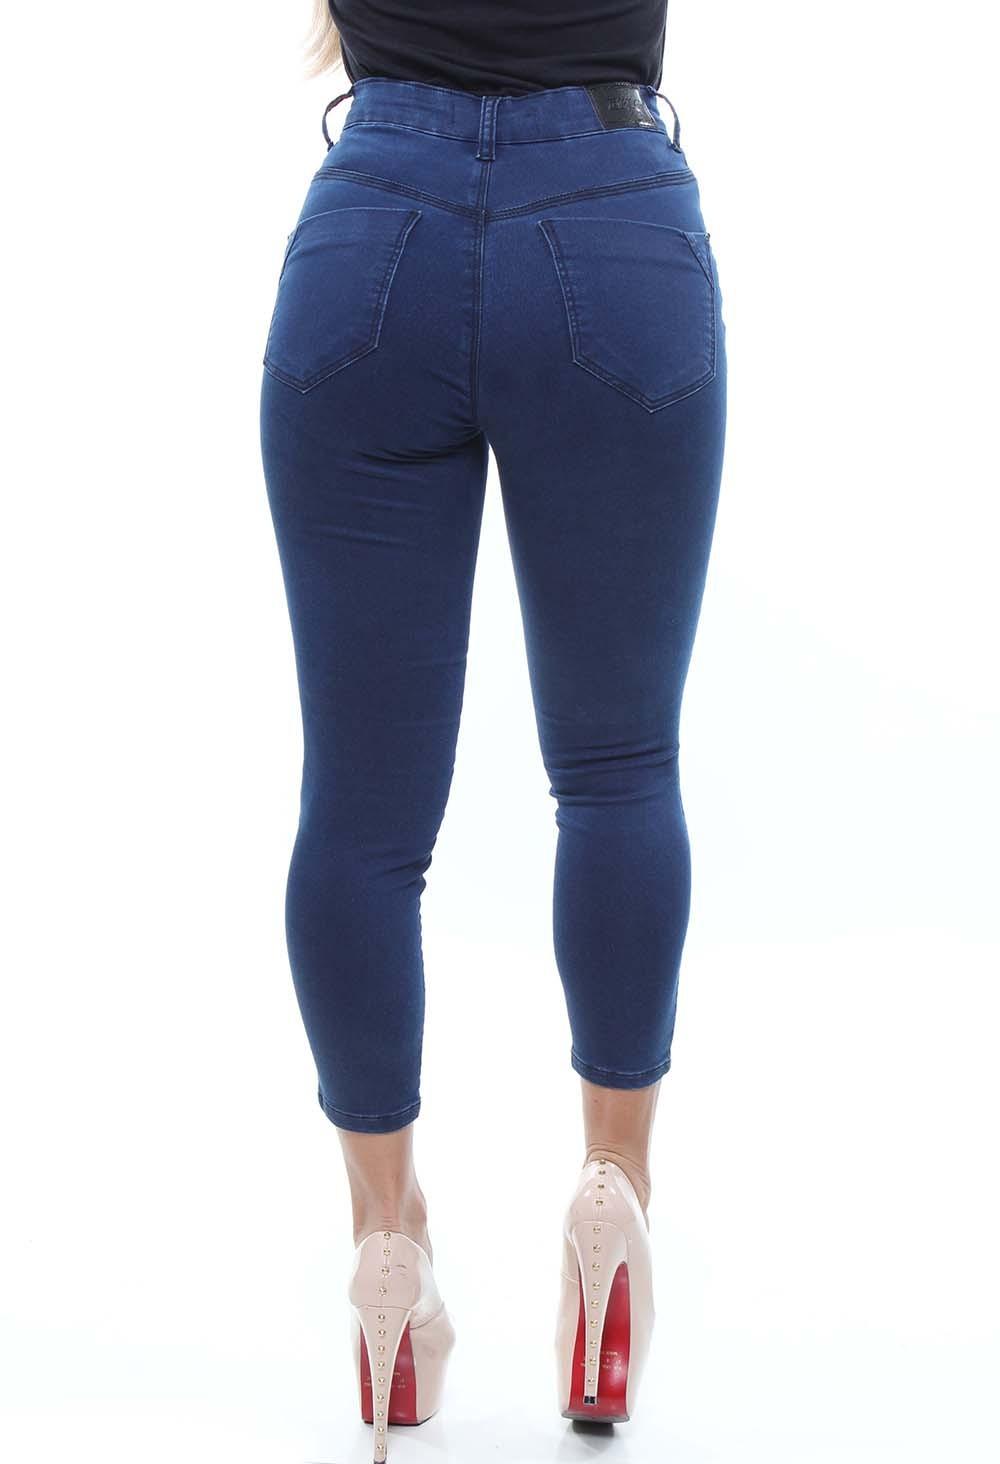 Calça Capri Jeans Feminina Crocker - 47751  - CROCKER JEANS